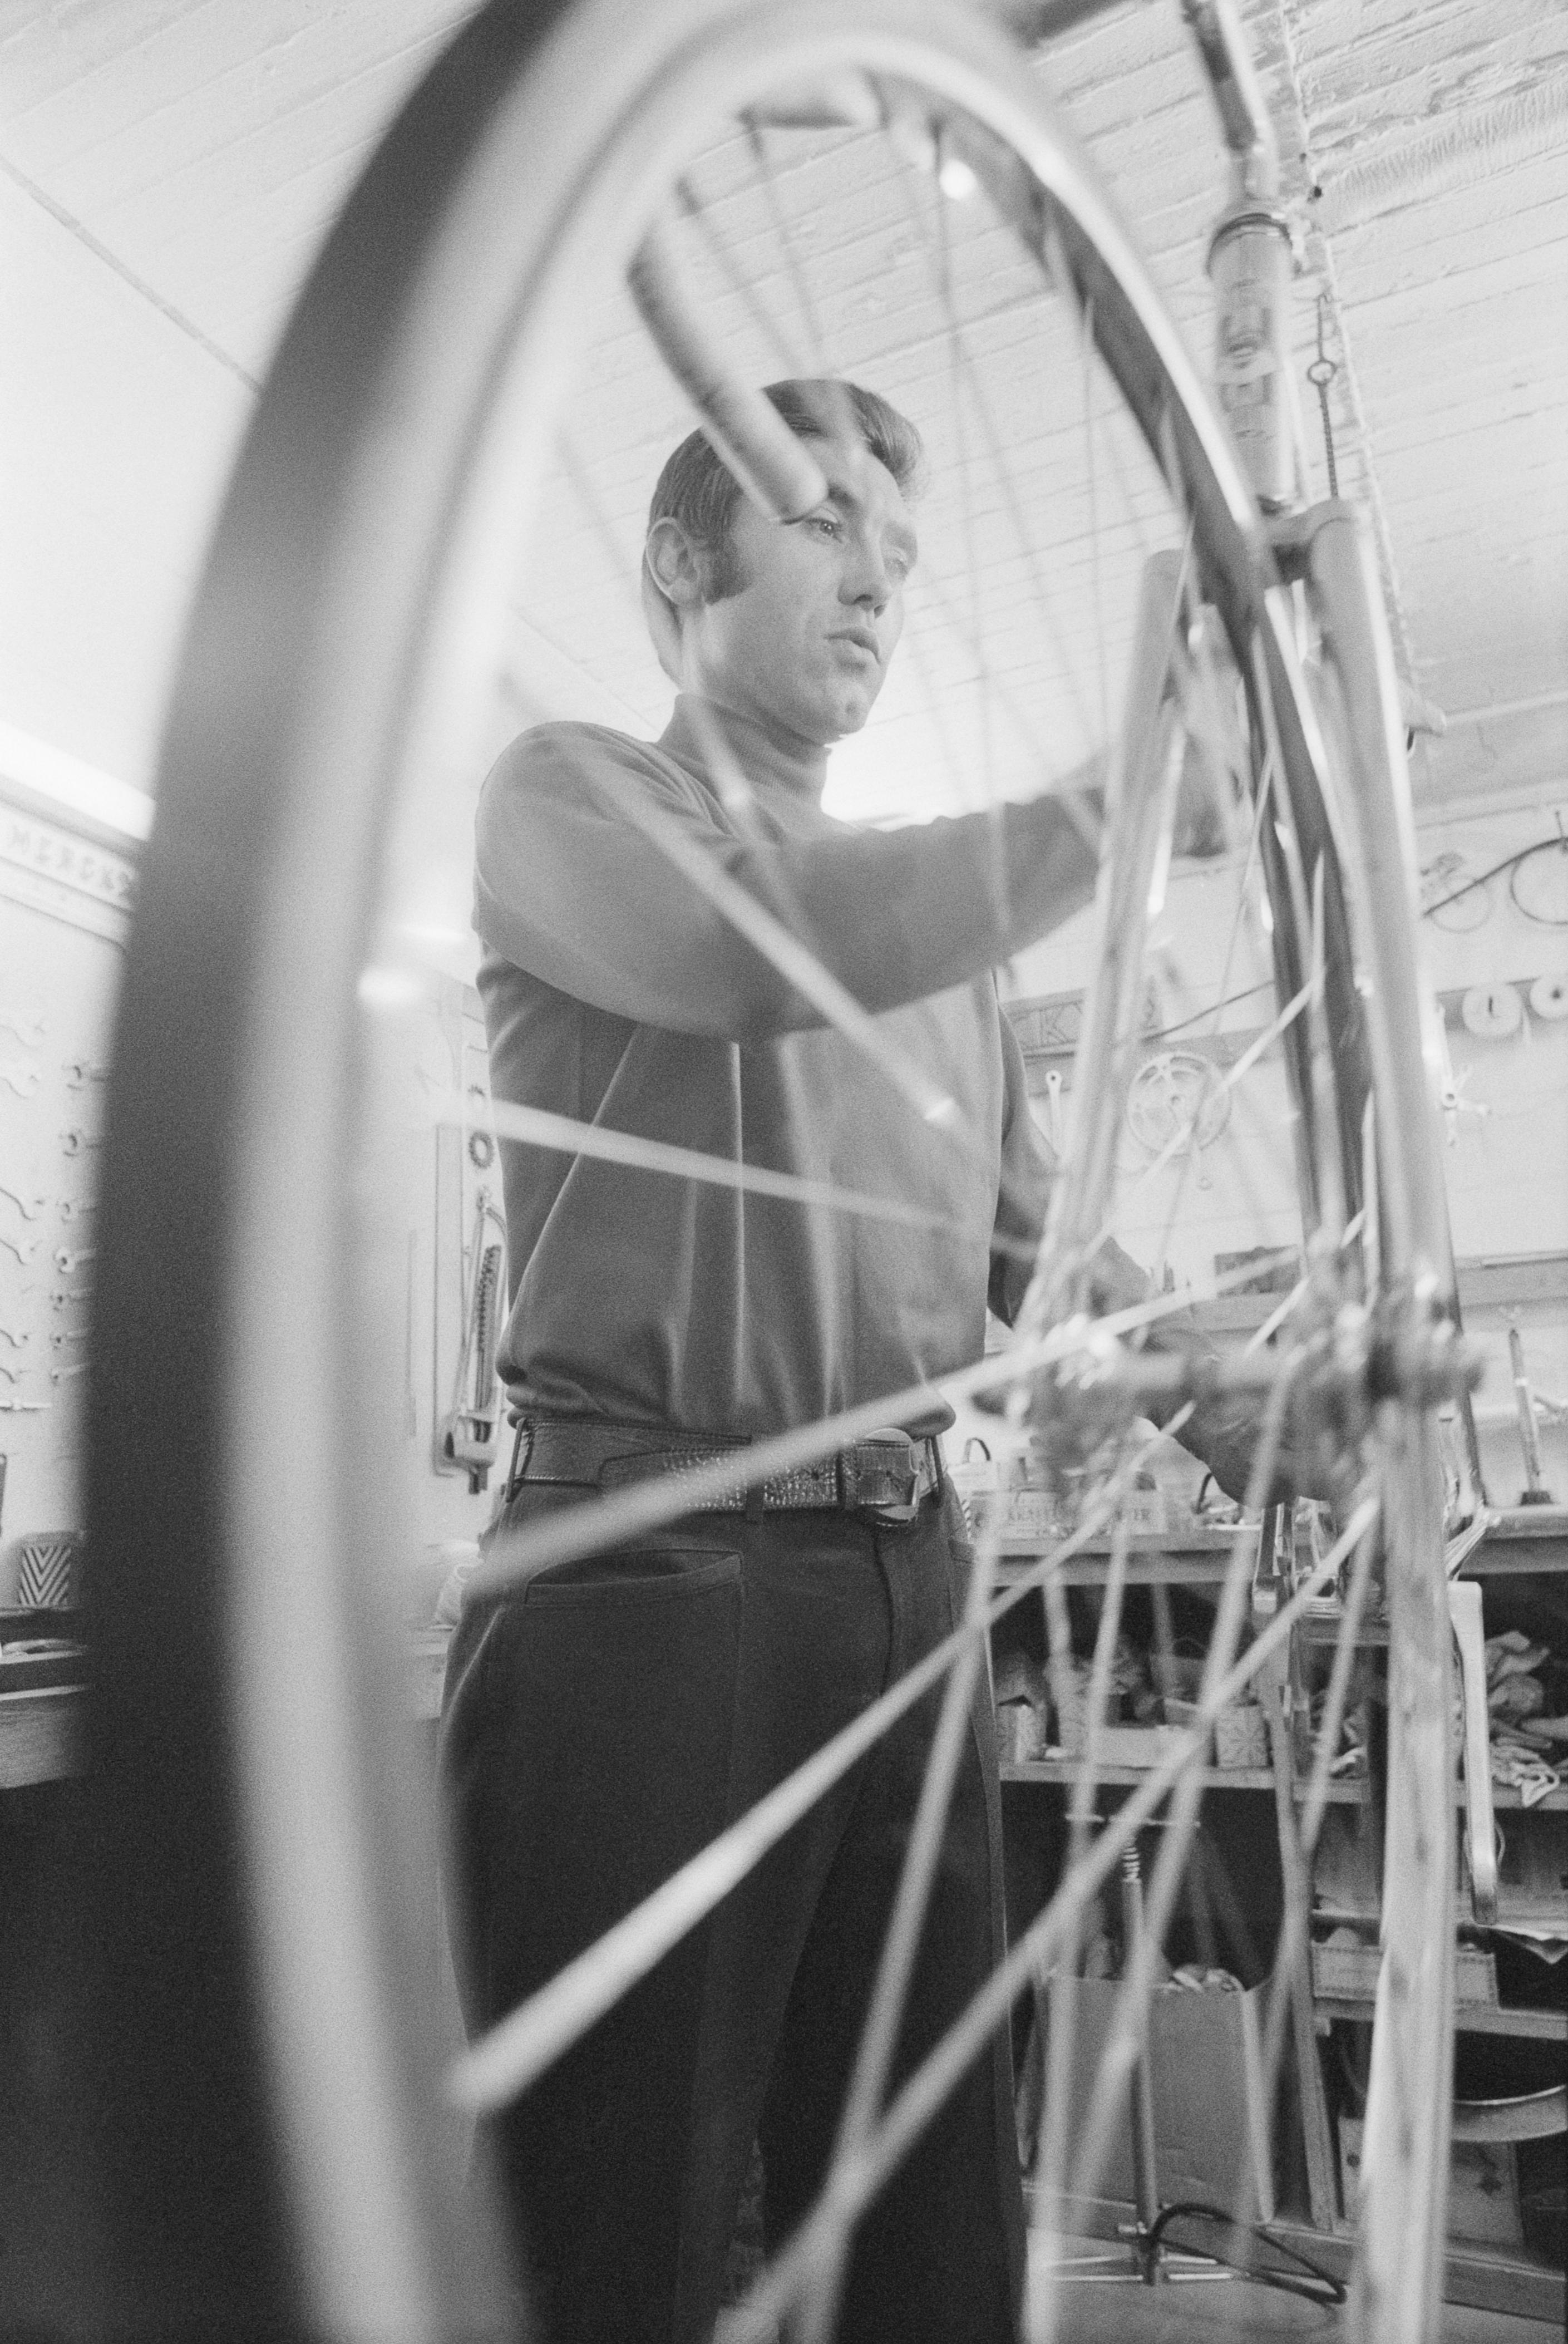 Eddy Merckx Repairing Bicycle